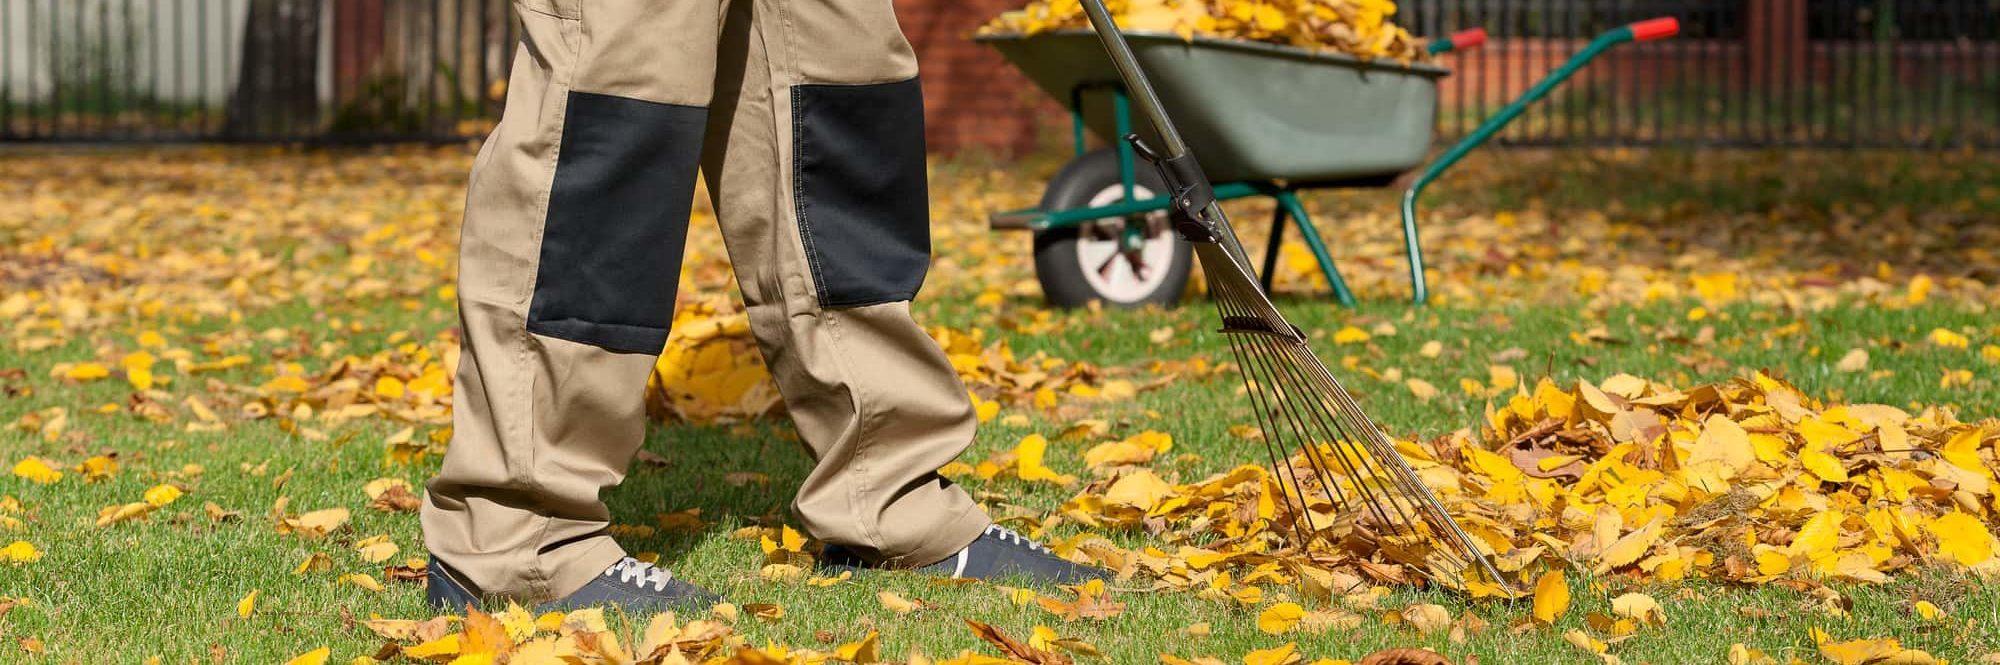 Person raking leafs